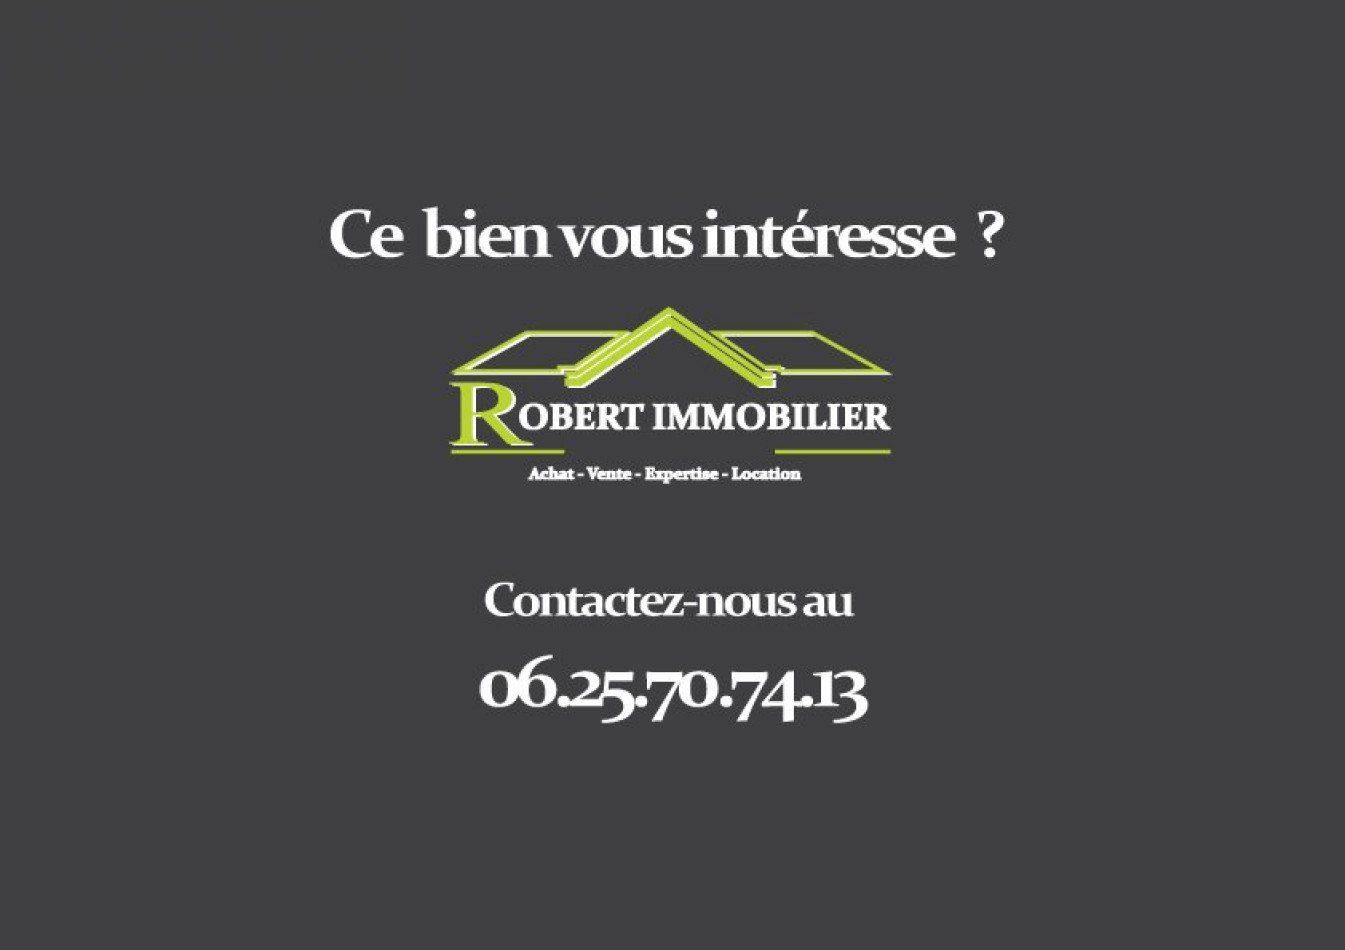 A vendre  Agde | Réf 345514448 - Robert immobilier